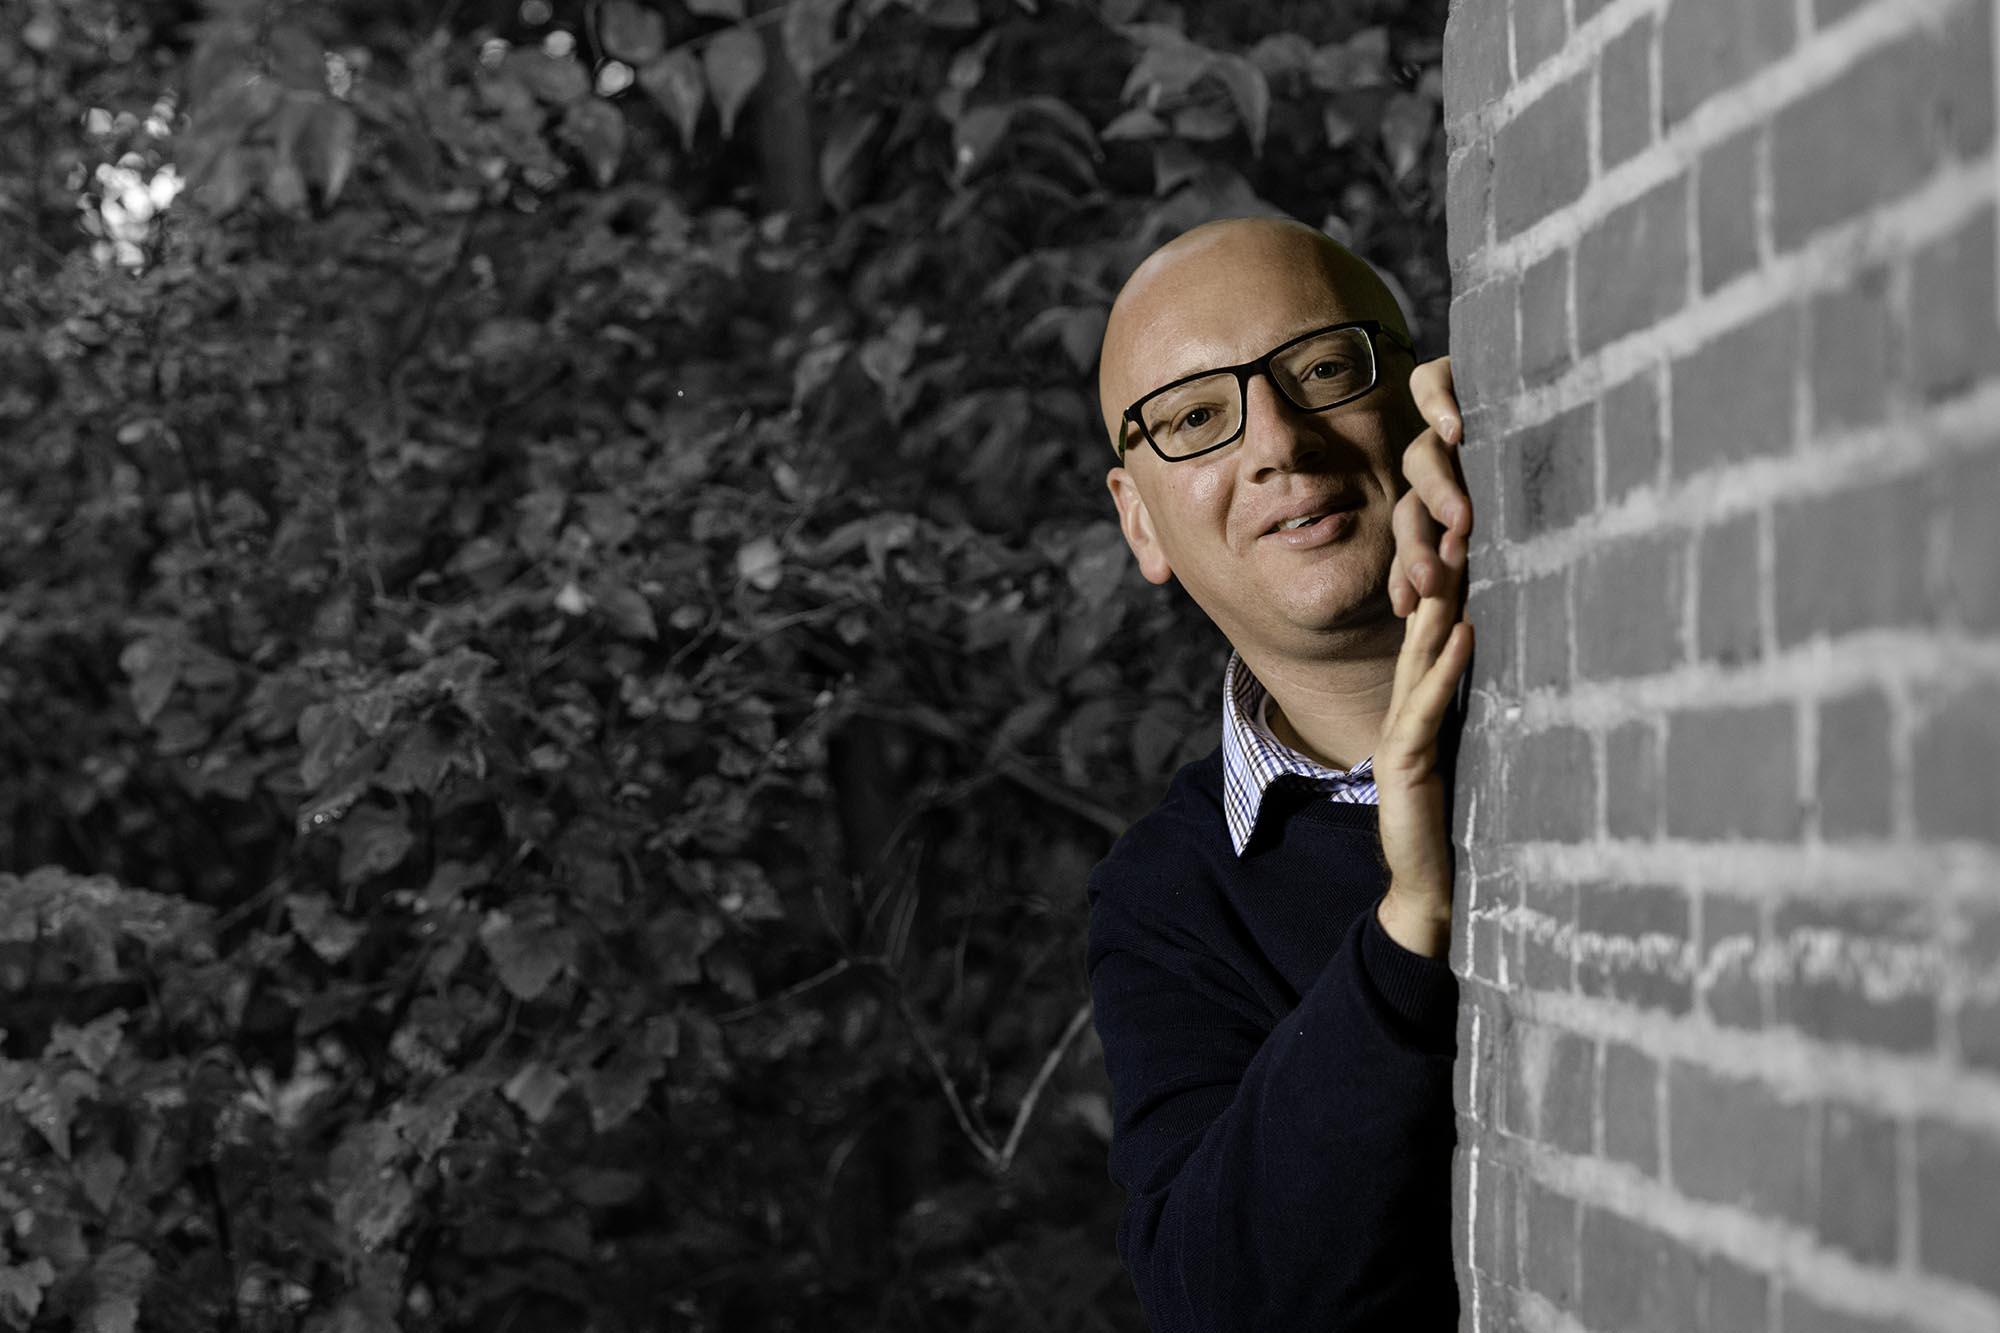 MvDD Oussama Bouaouiouach